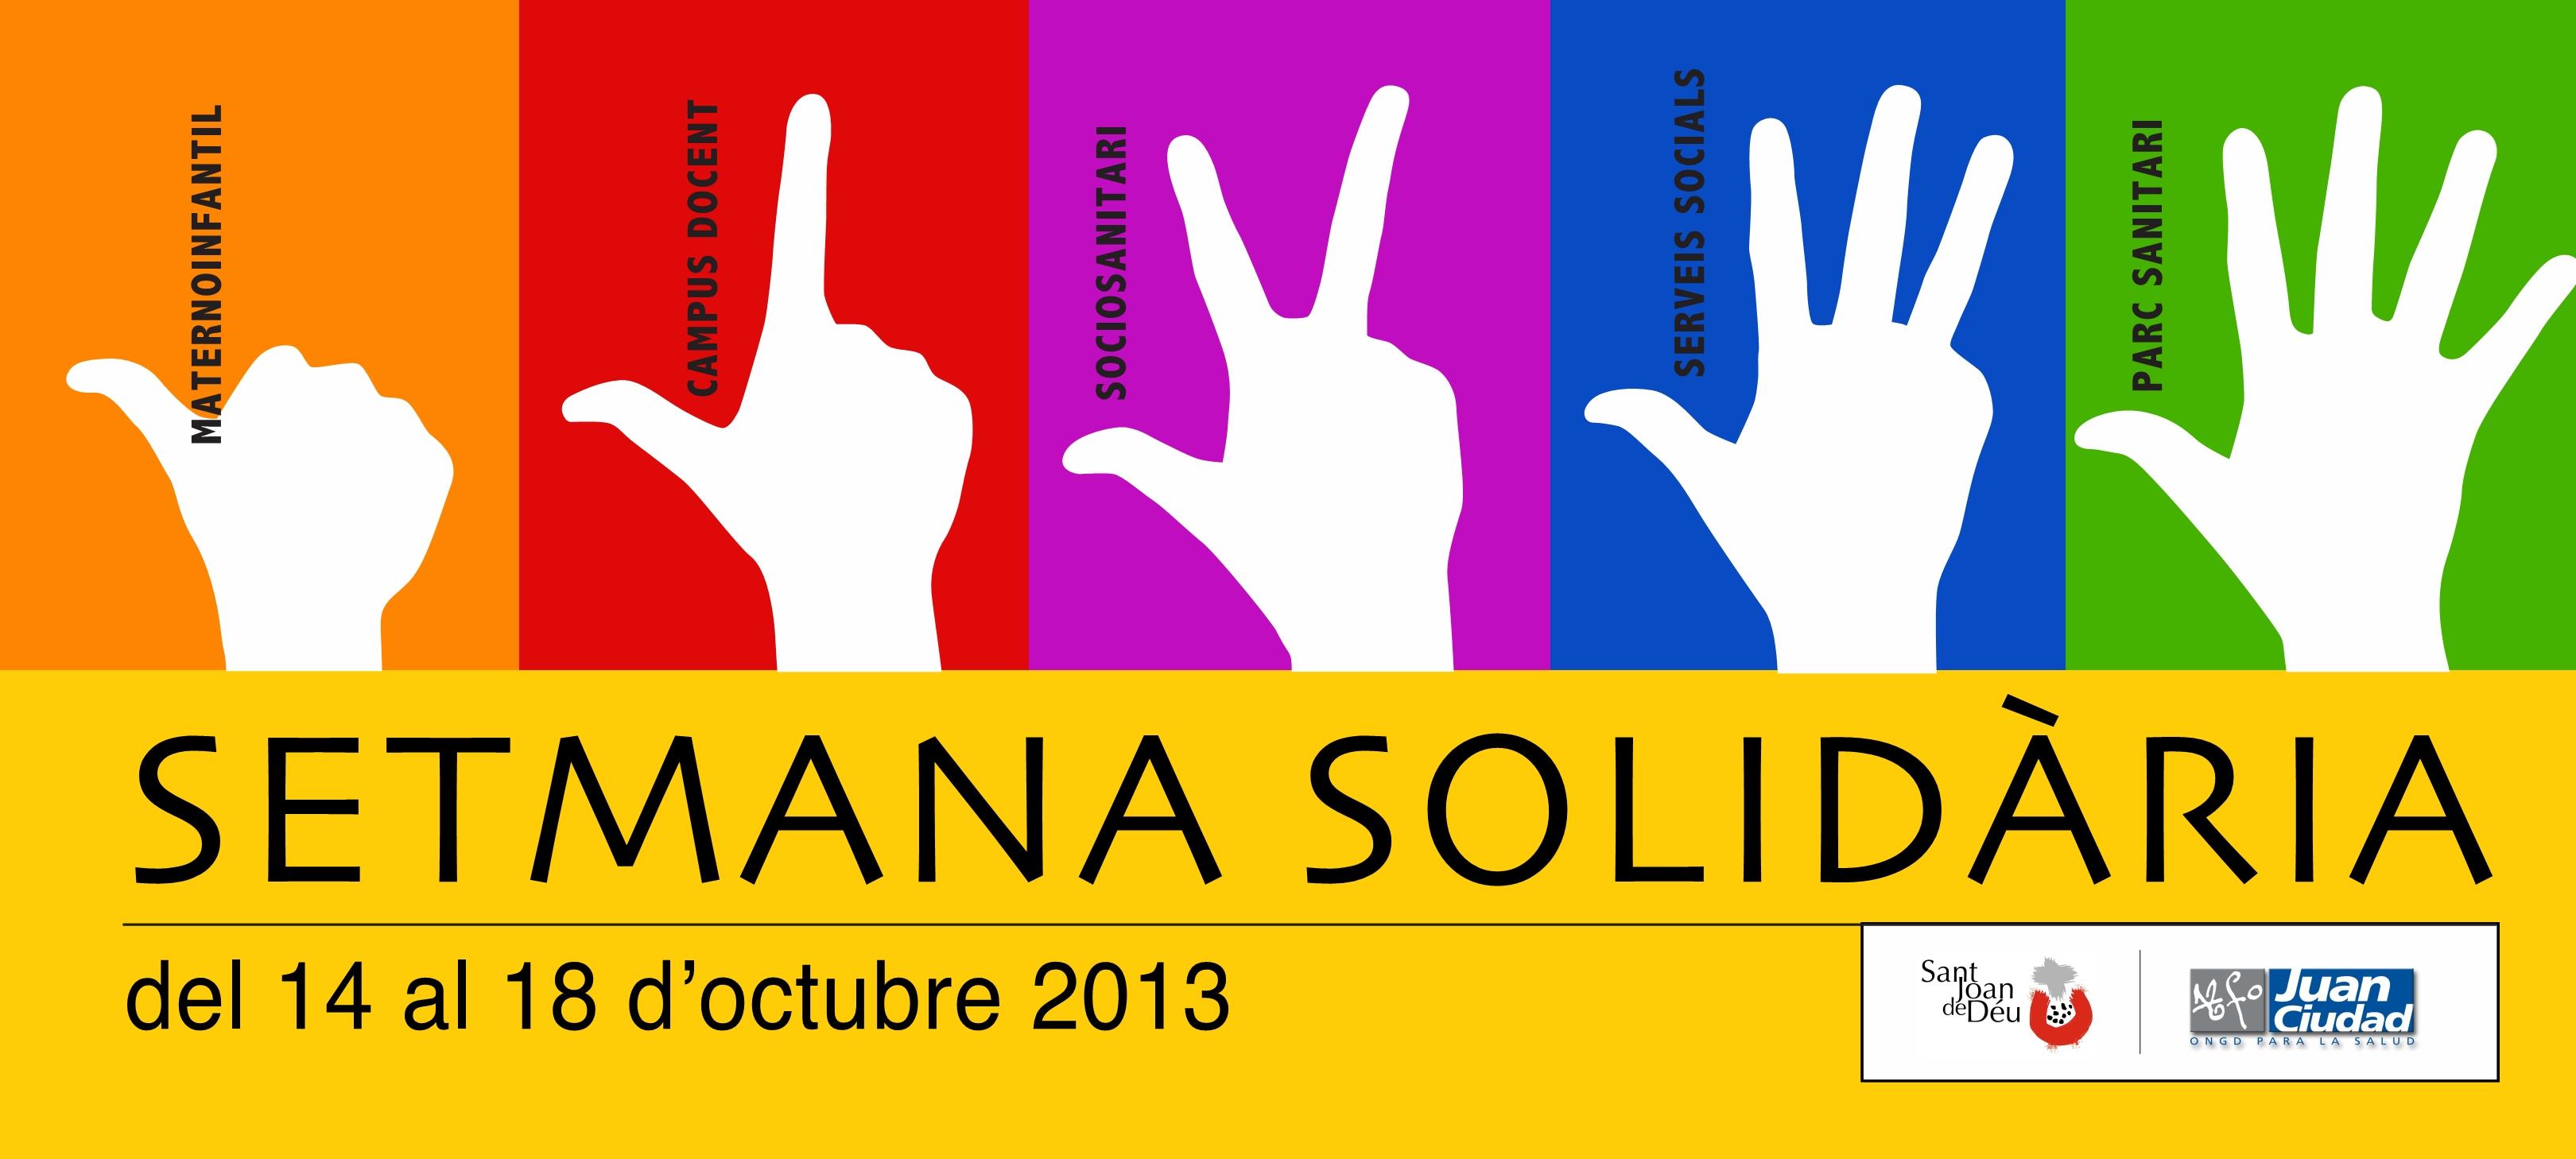 Del 14 al 18 de octubre se celebró la Semana Solidaria con Juan ...